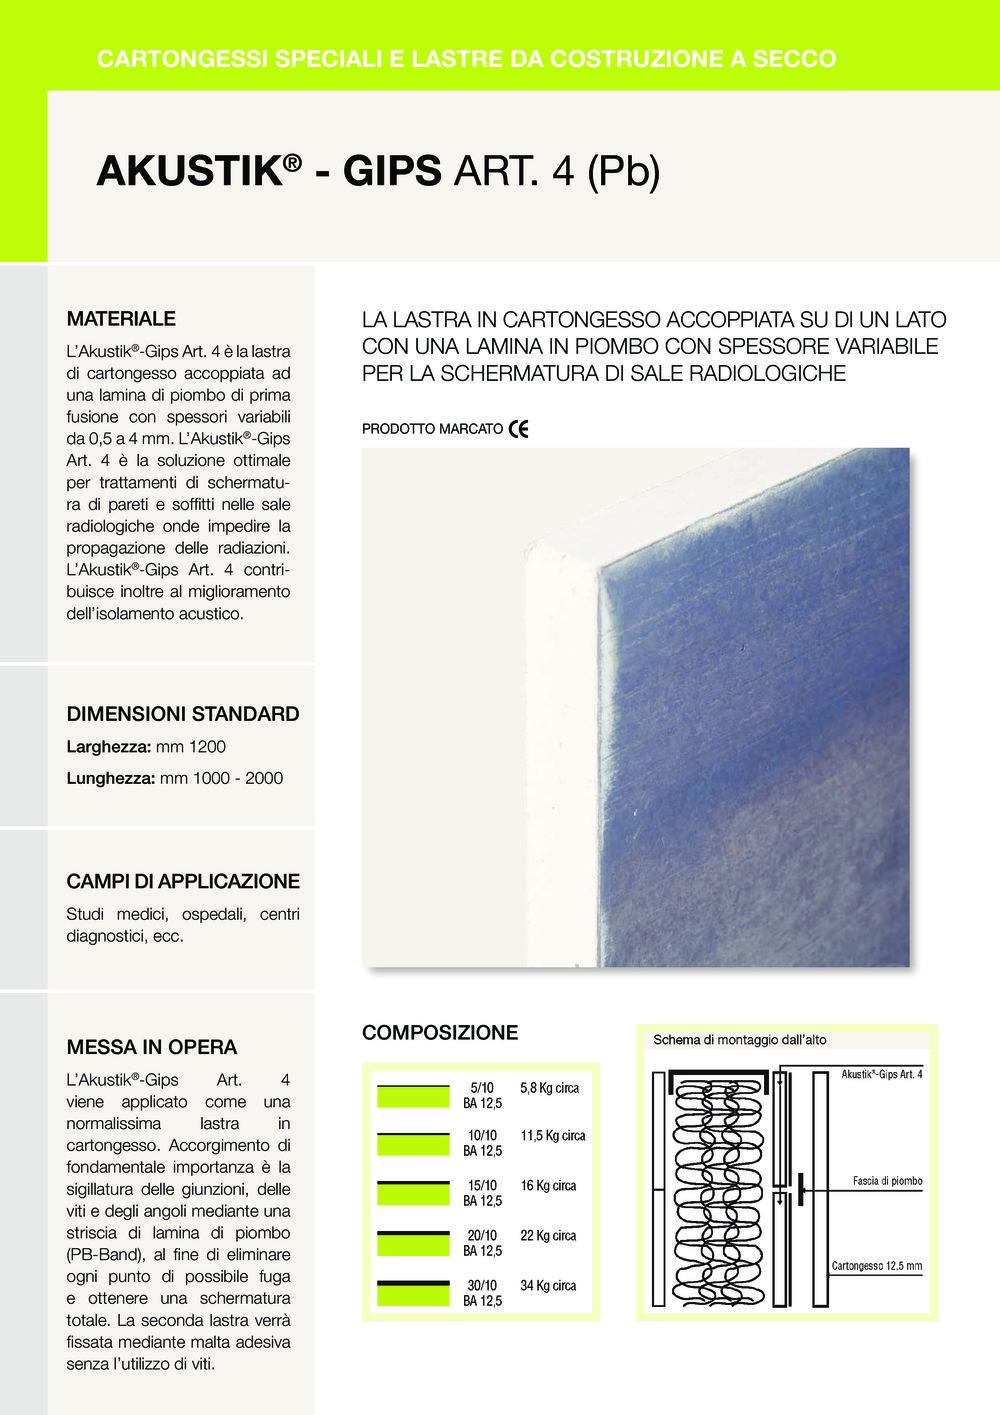 AKUSTIK ® - GIPS ART. 4